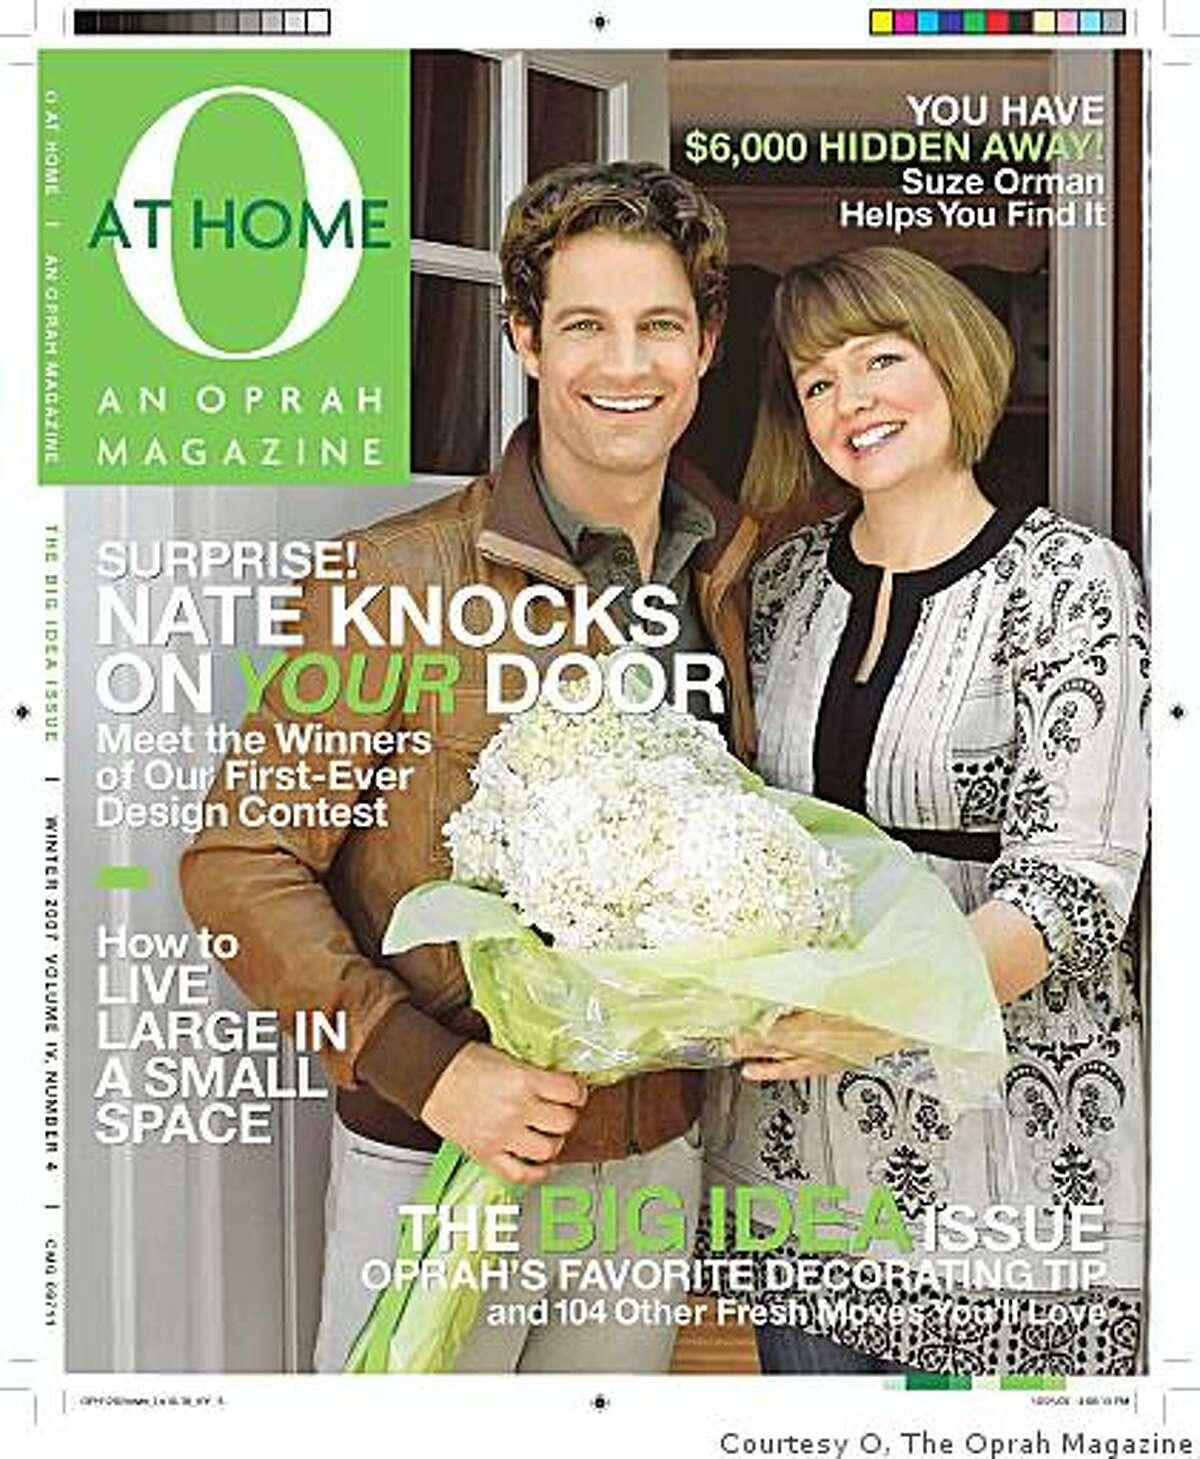 O at Home magazine cover